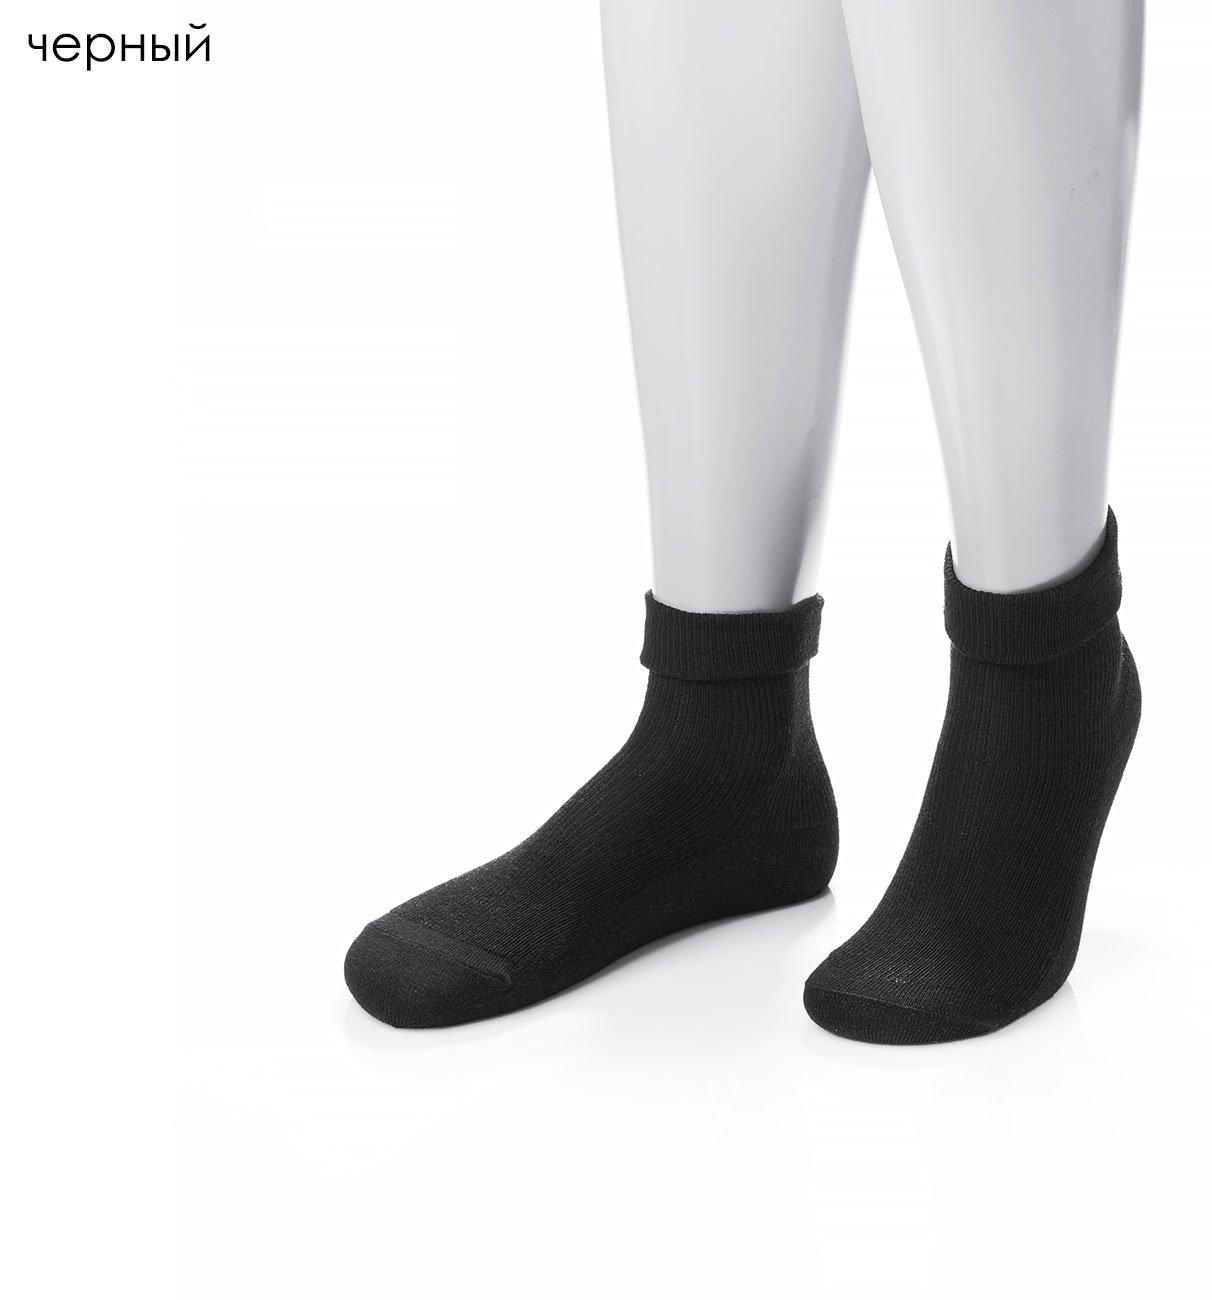 Женские шерстяные носки 16SC4 Sergio di Calze